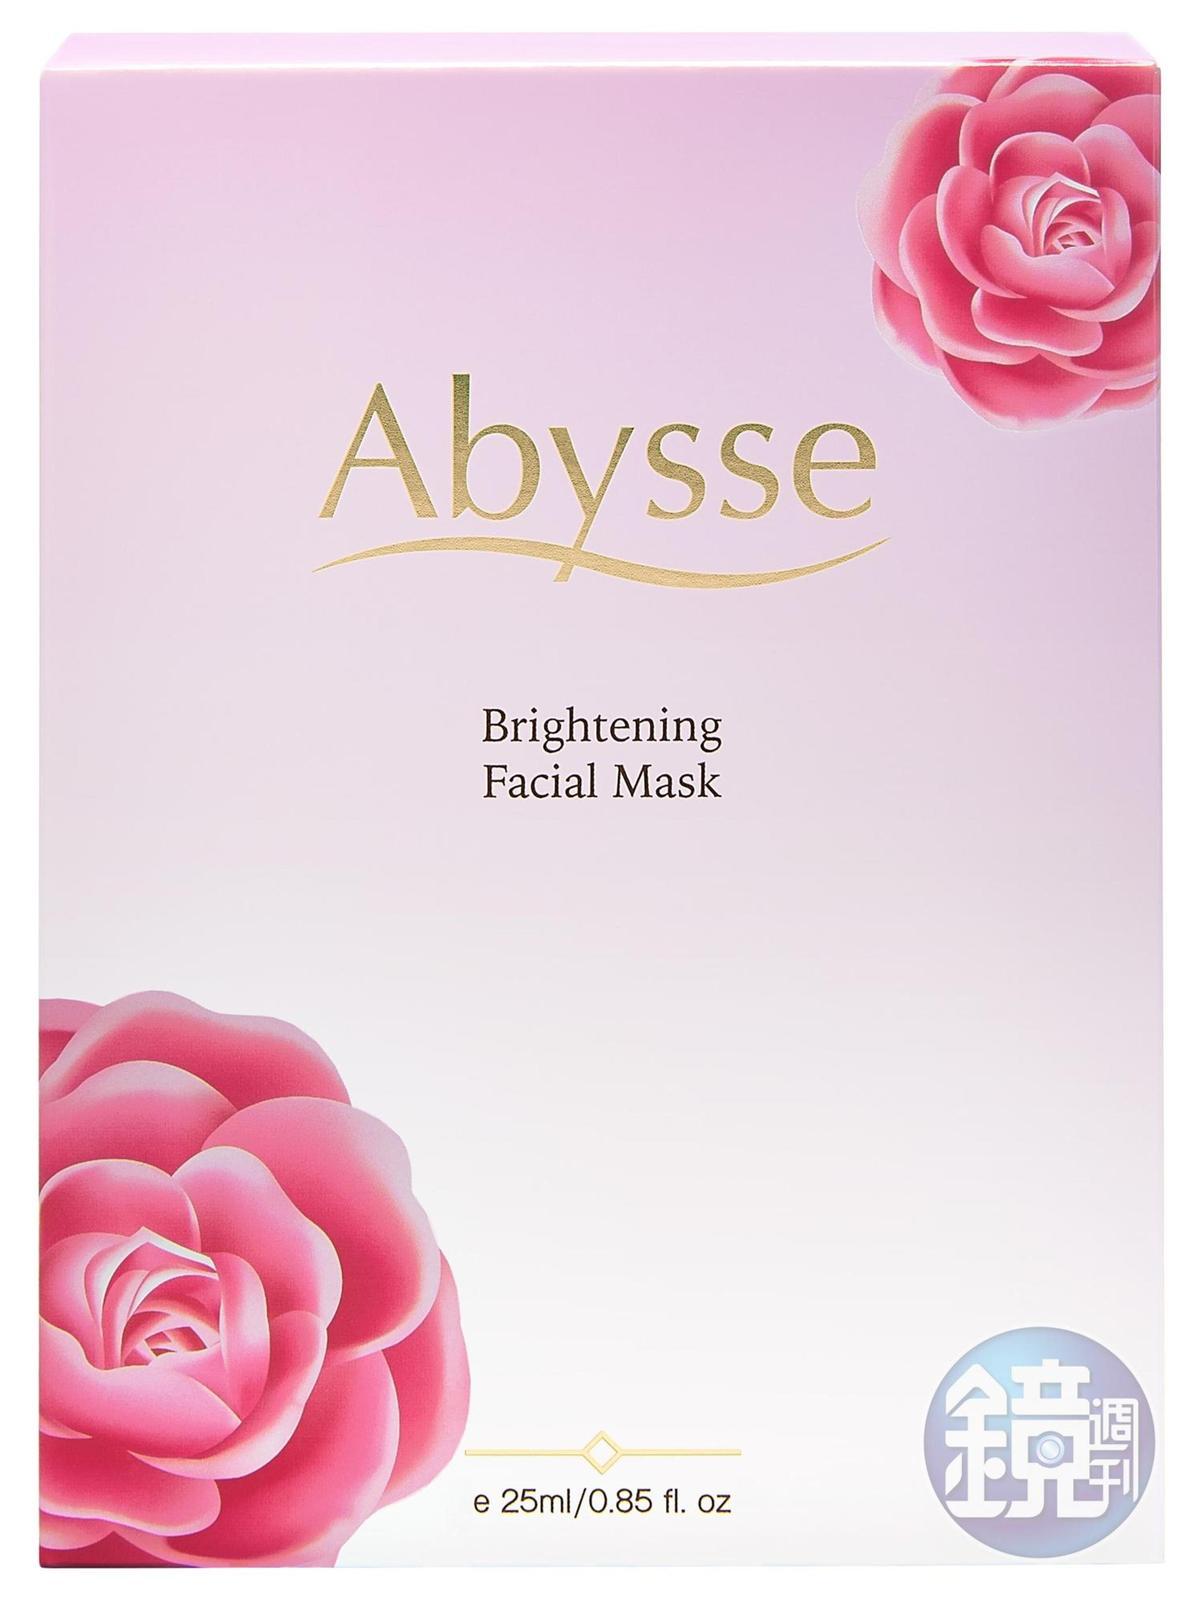 Abysse多效晶透修護面膜NT$1,580。